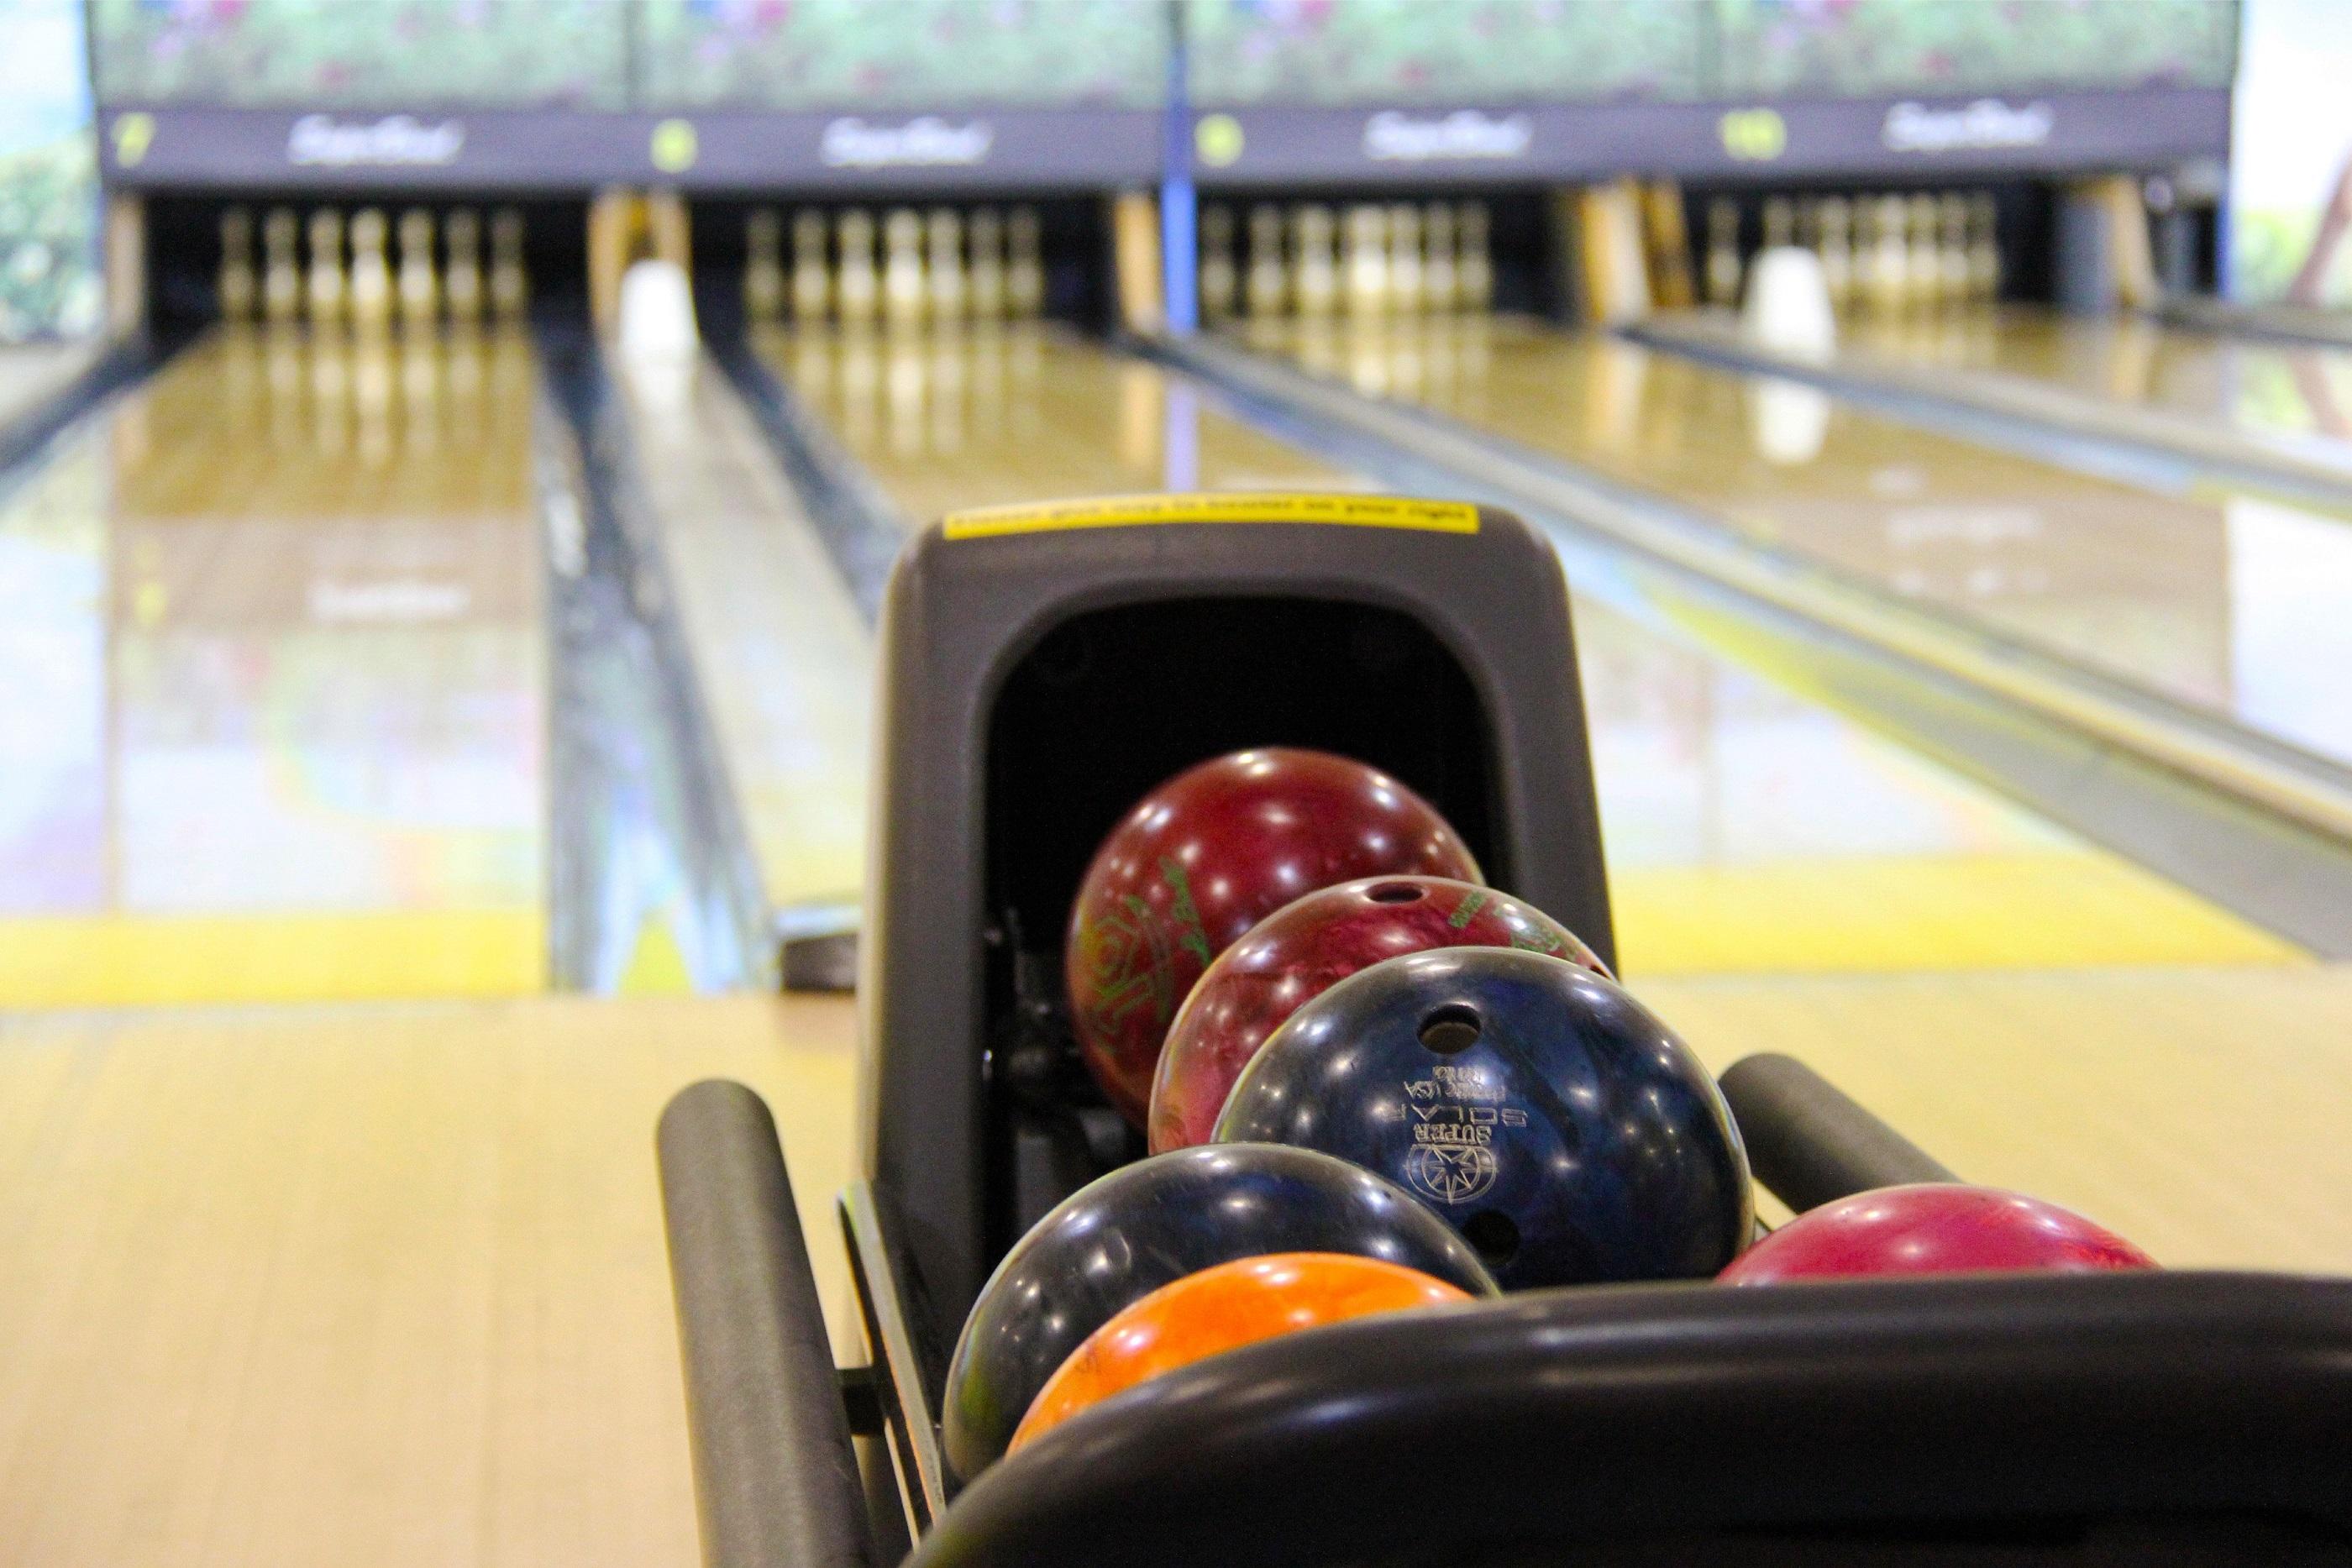 bergen county bowling